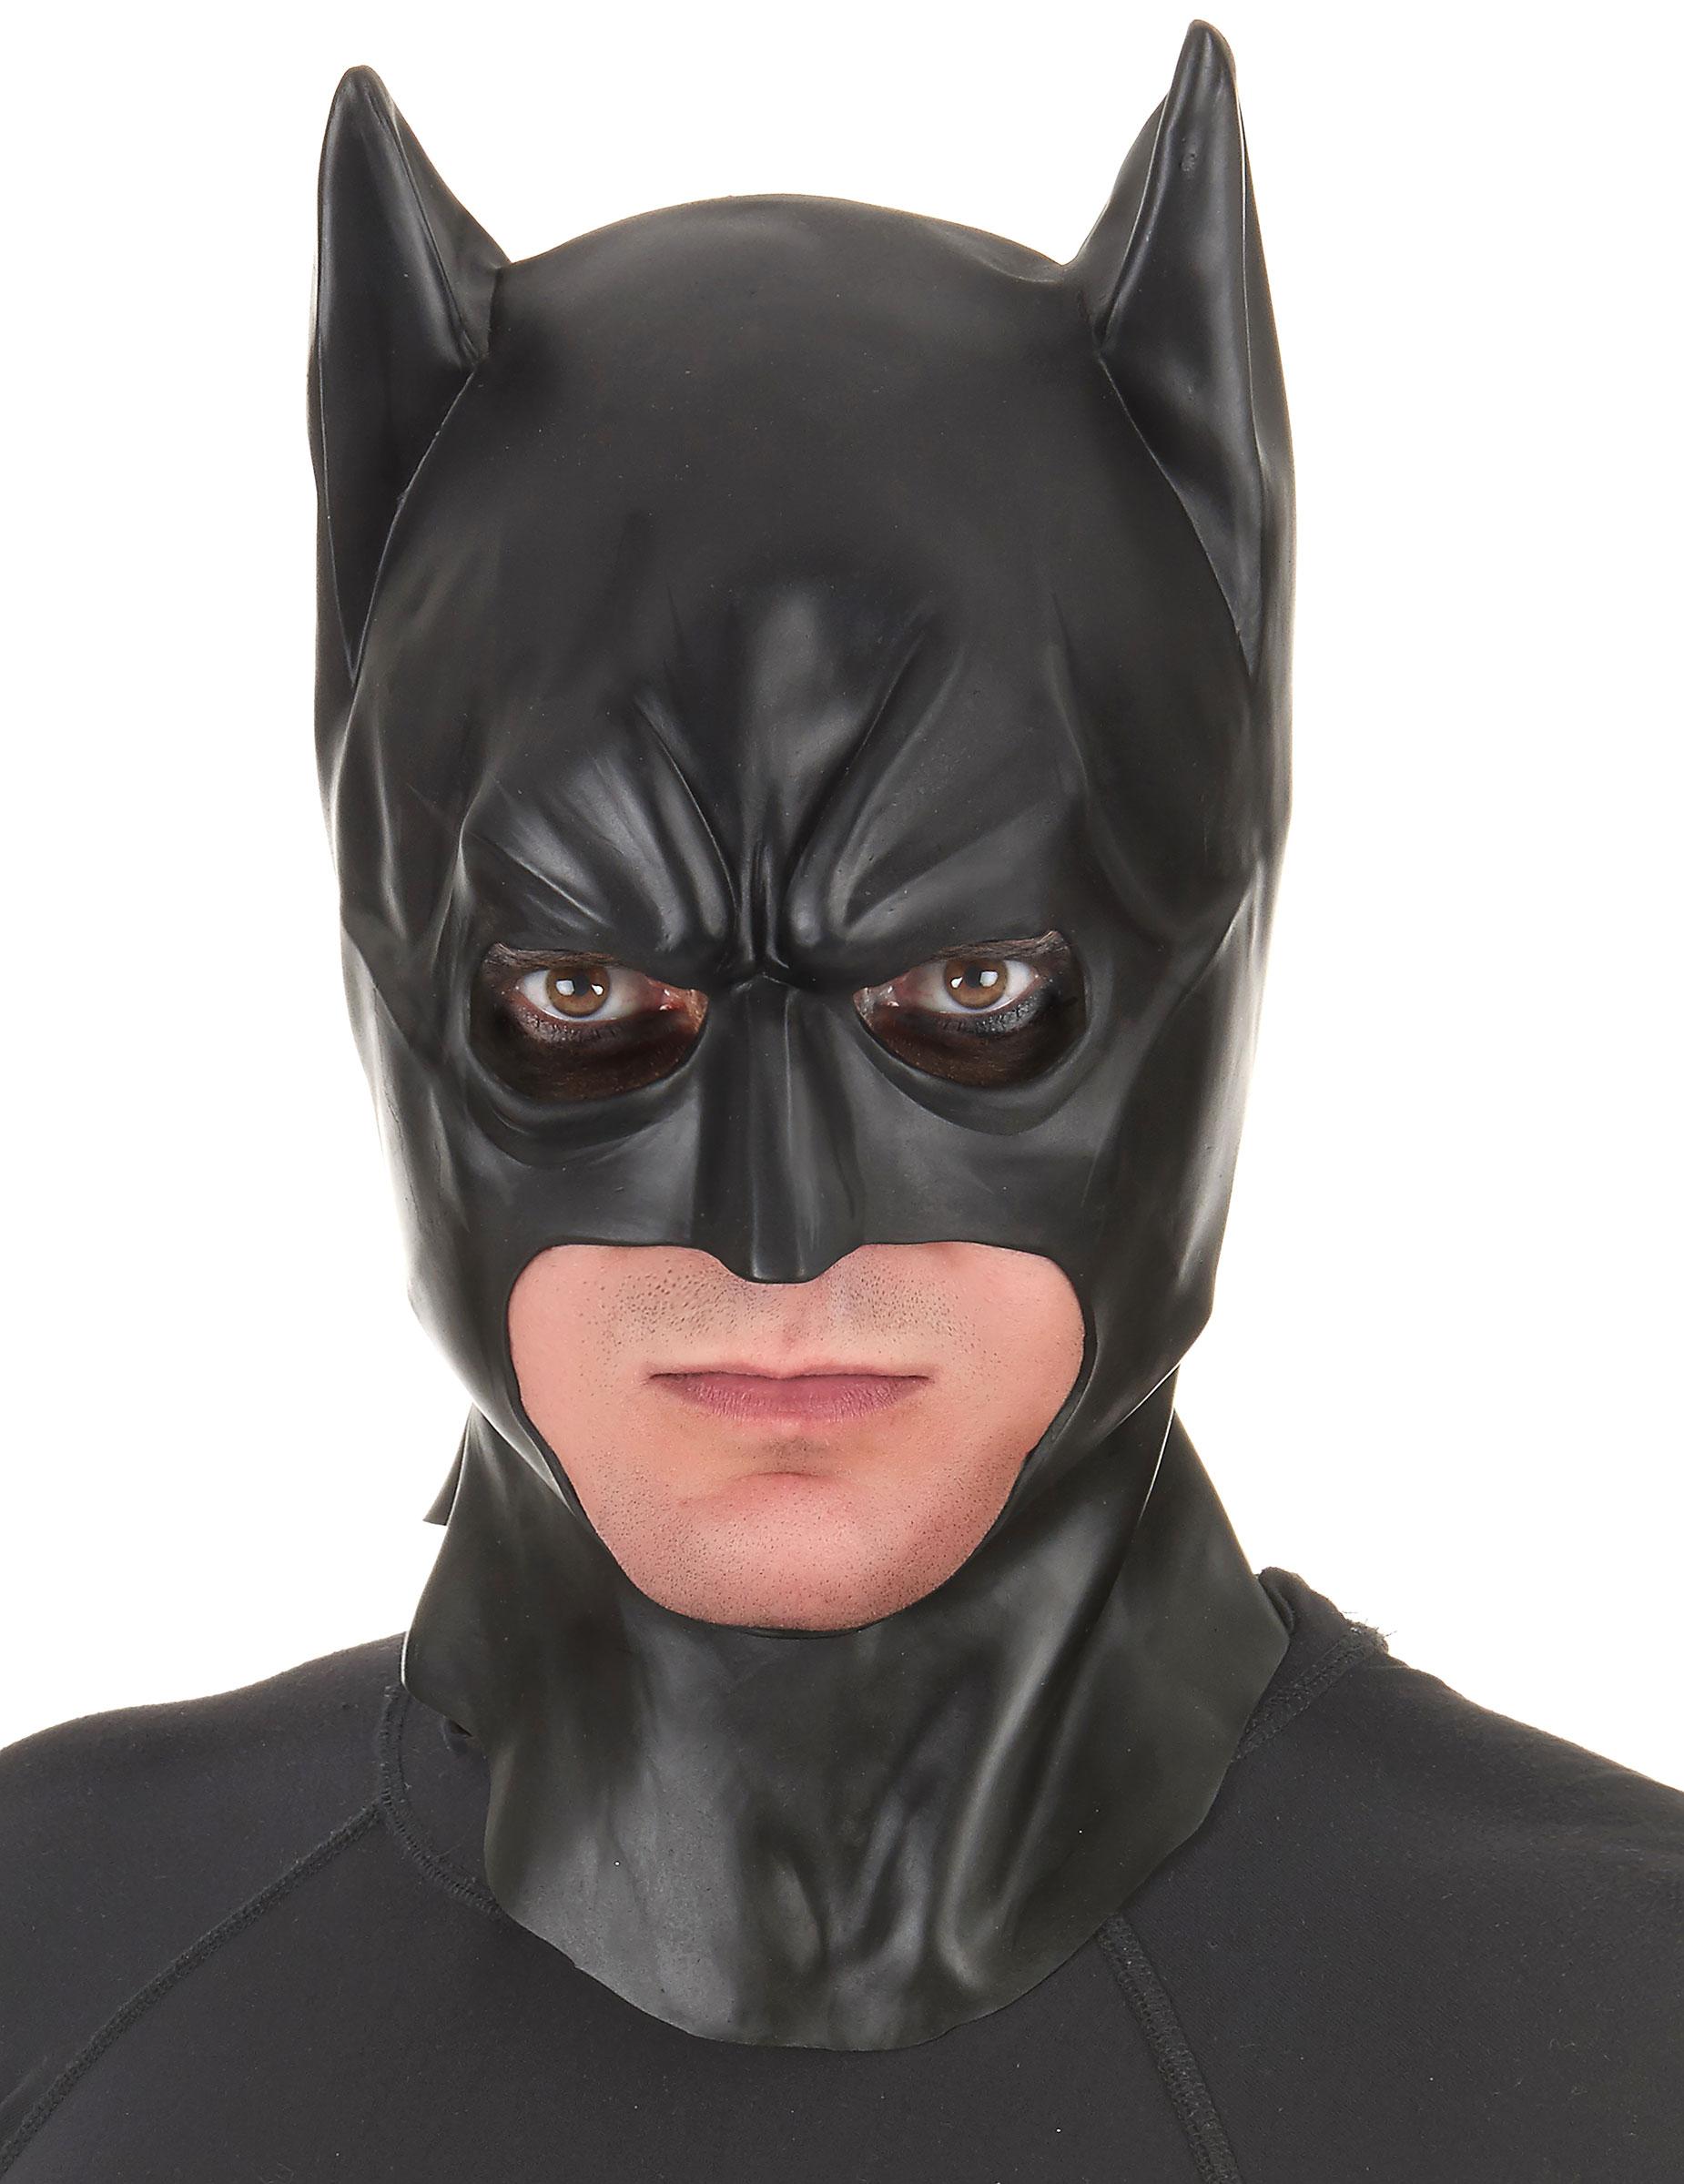 fledermausmaske f r erwachsene masken und g nstige faschingskost me vegaoo. Black Bedroom Furniture Sets. Home Design Ideas